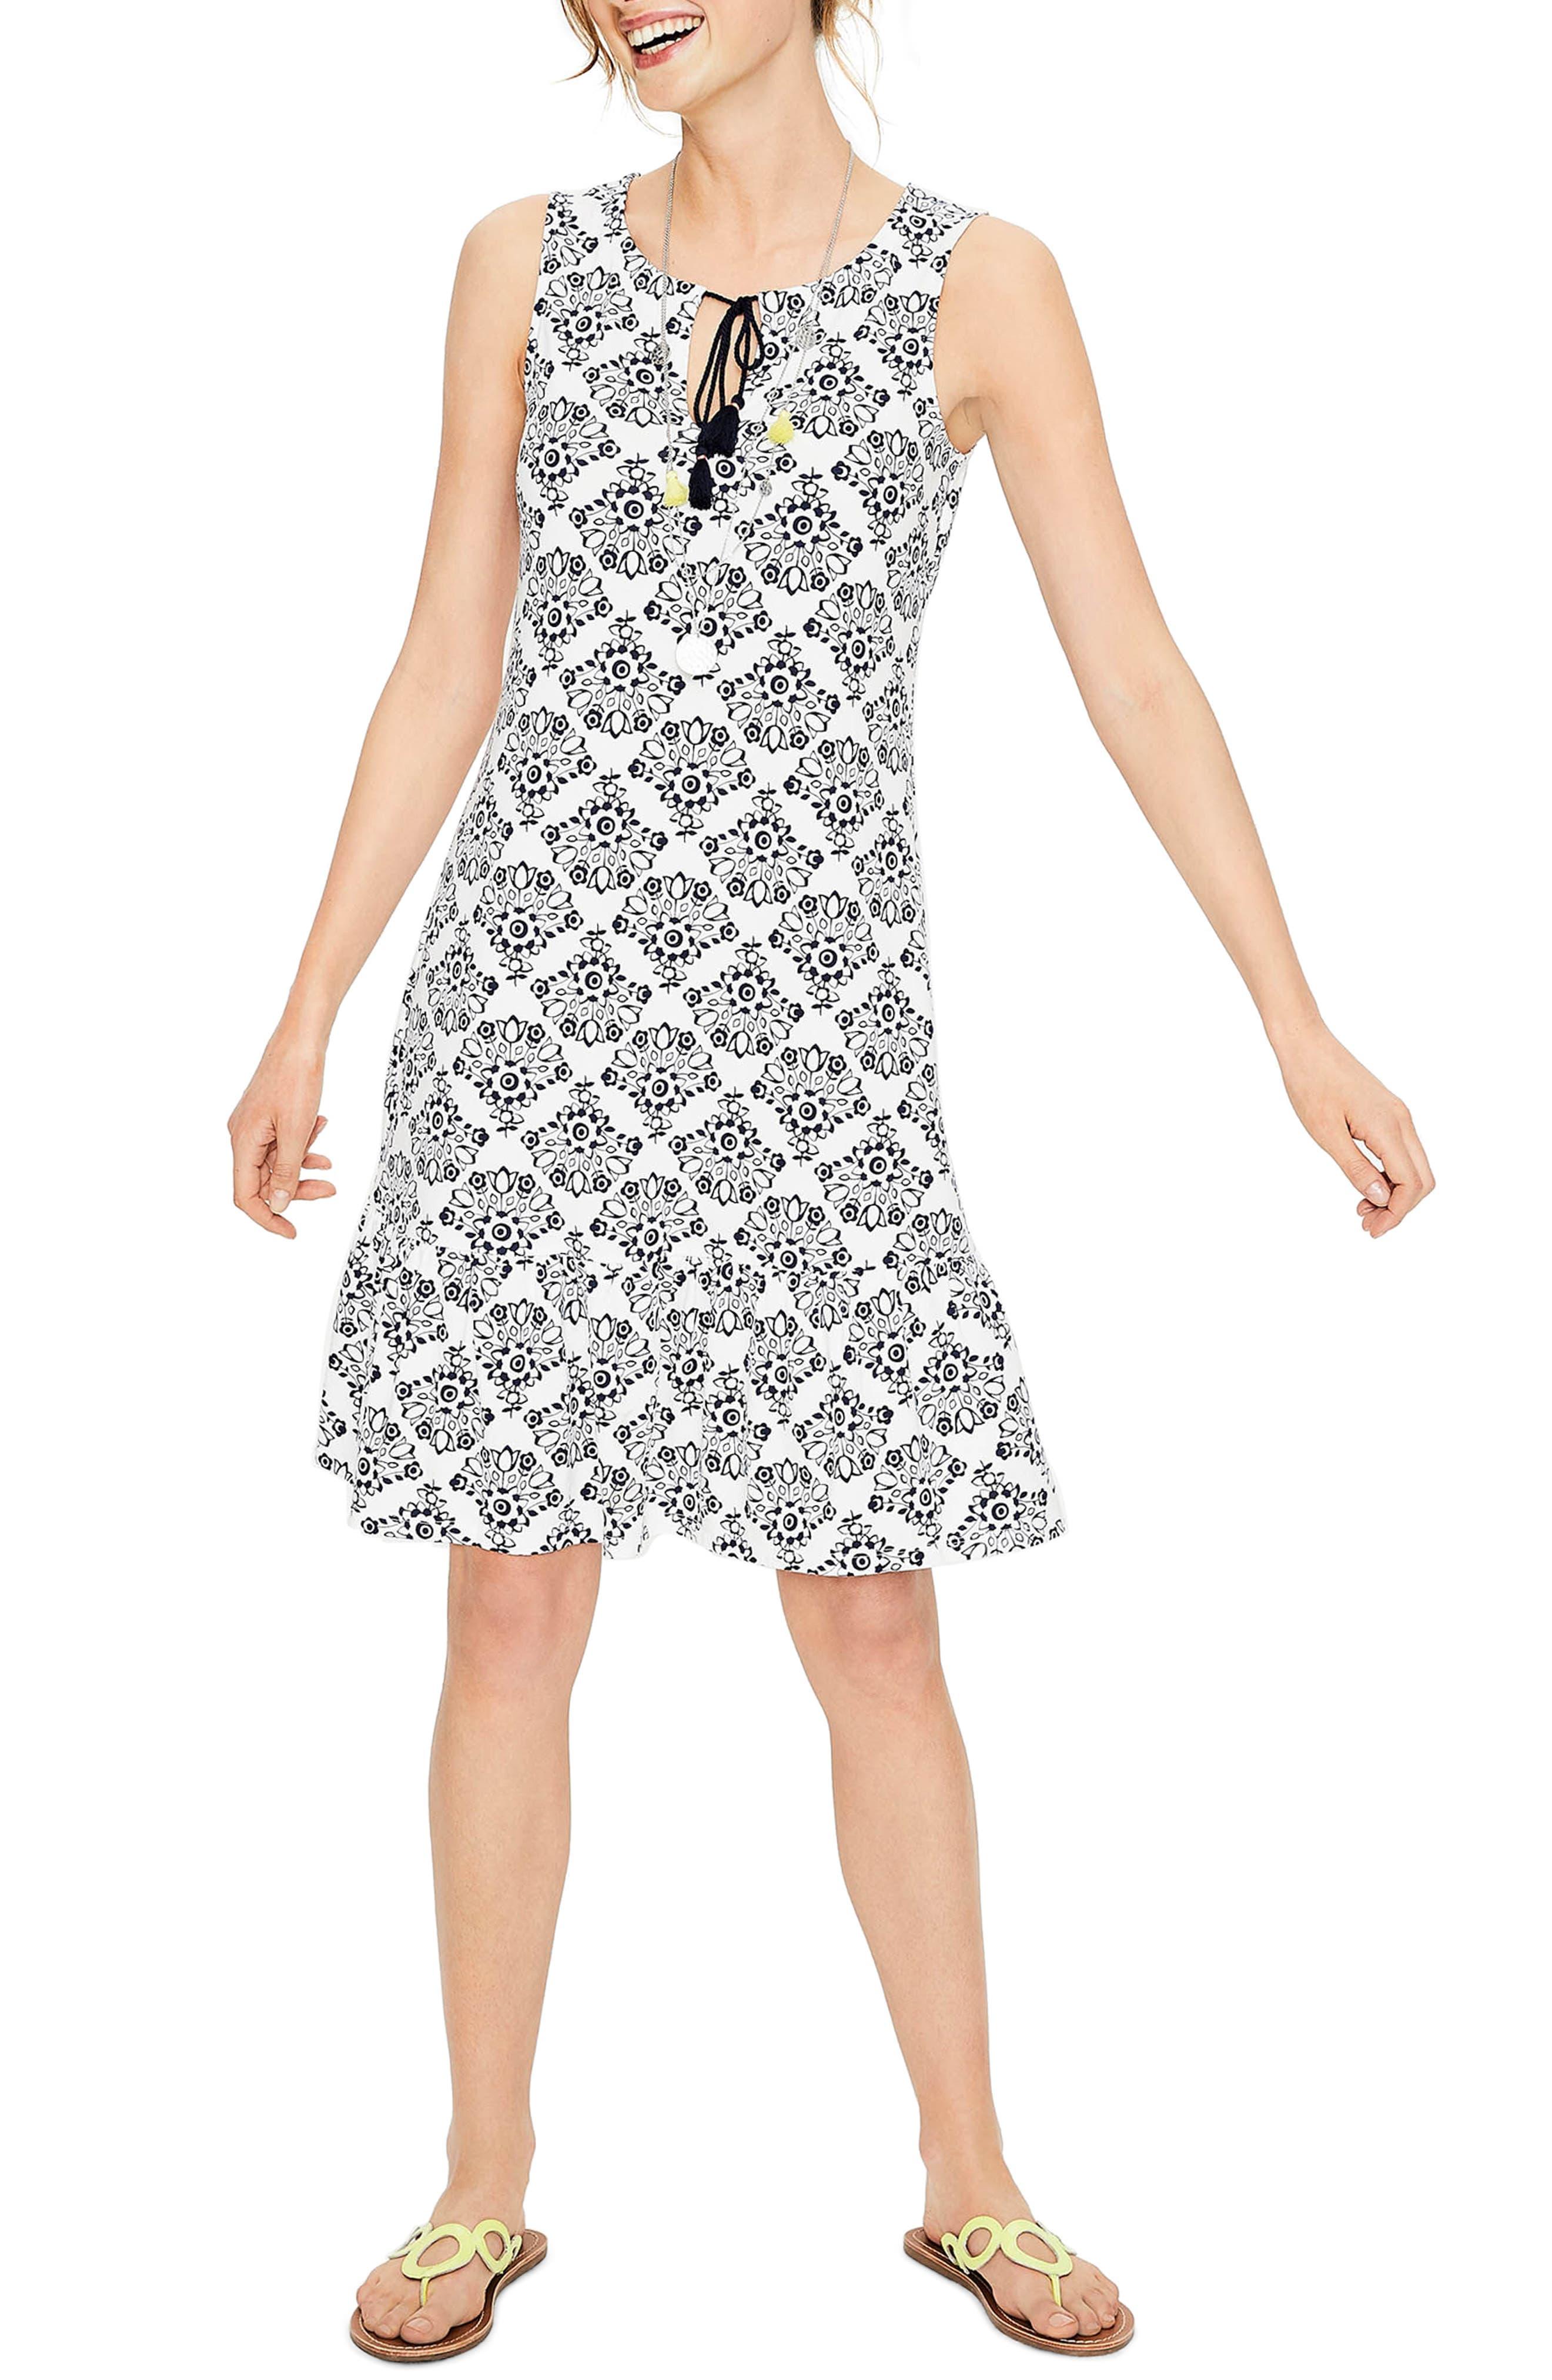 Tassel Tie Print Tank Dress,                             Main thumbnail 1, color,                             Ivory/Navy Floral Bo